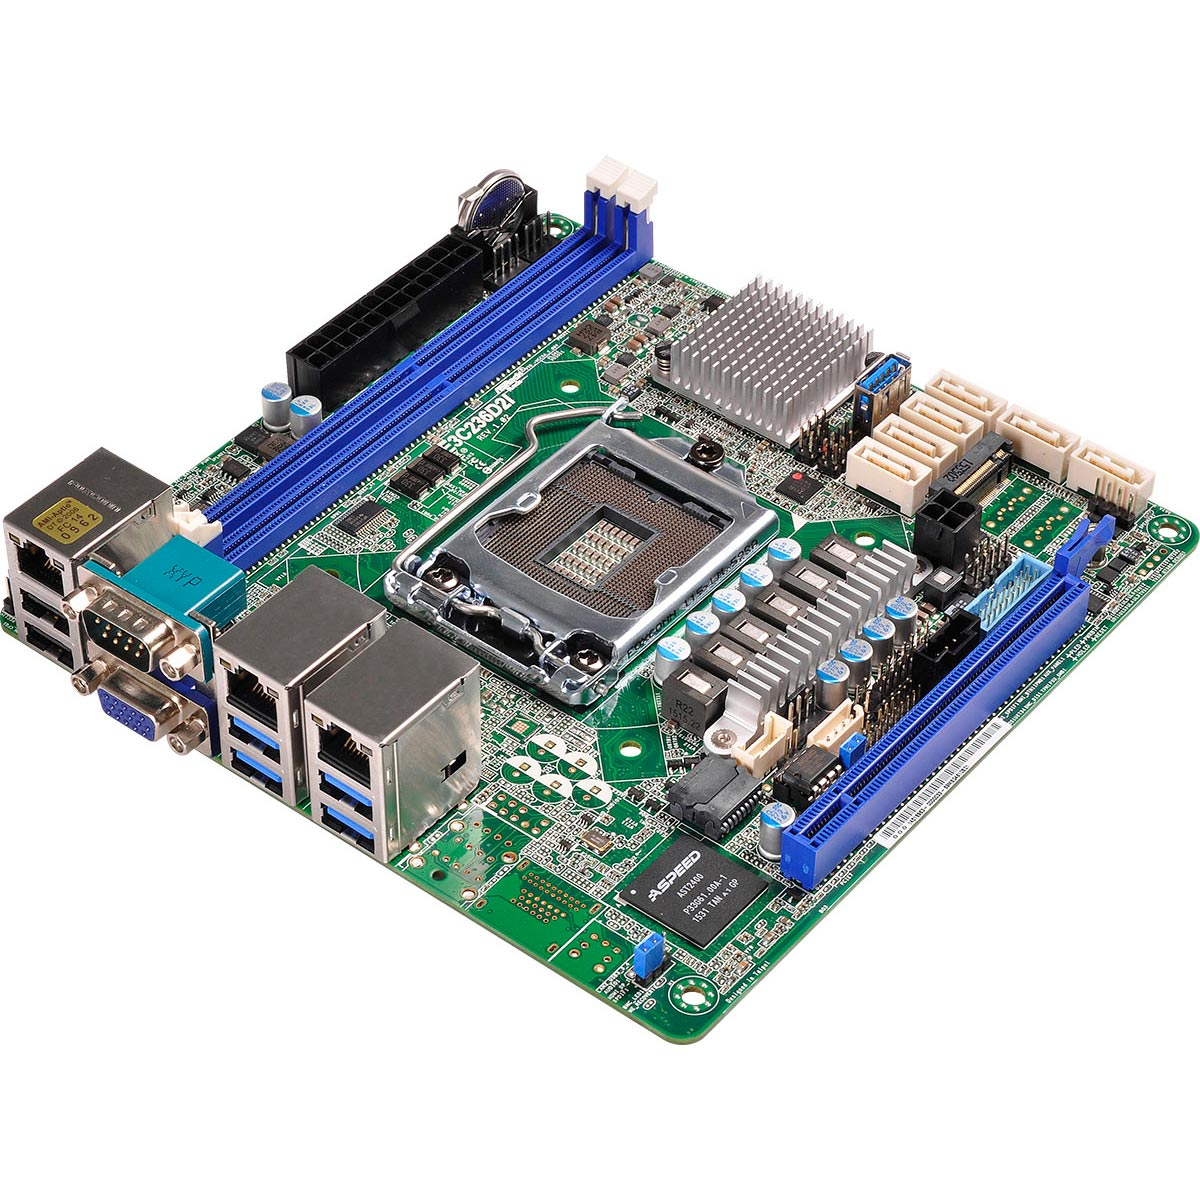 Carte mère ASRock E3C236D2I Carte mère Mini ITX Socket 1151 Intel C236 - SATA 6Gb/s - 1x PCI Express 3.0 16x - 2x Gigabit LAN + 1x RJ 45 Management